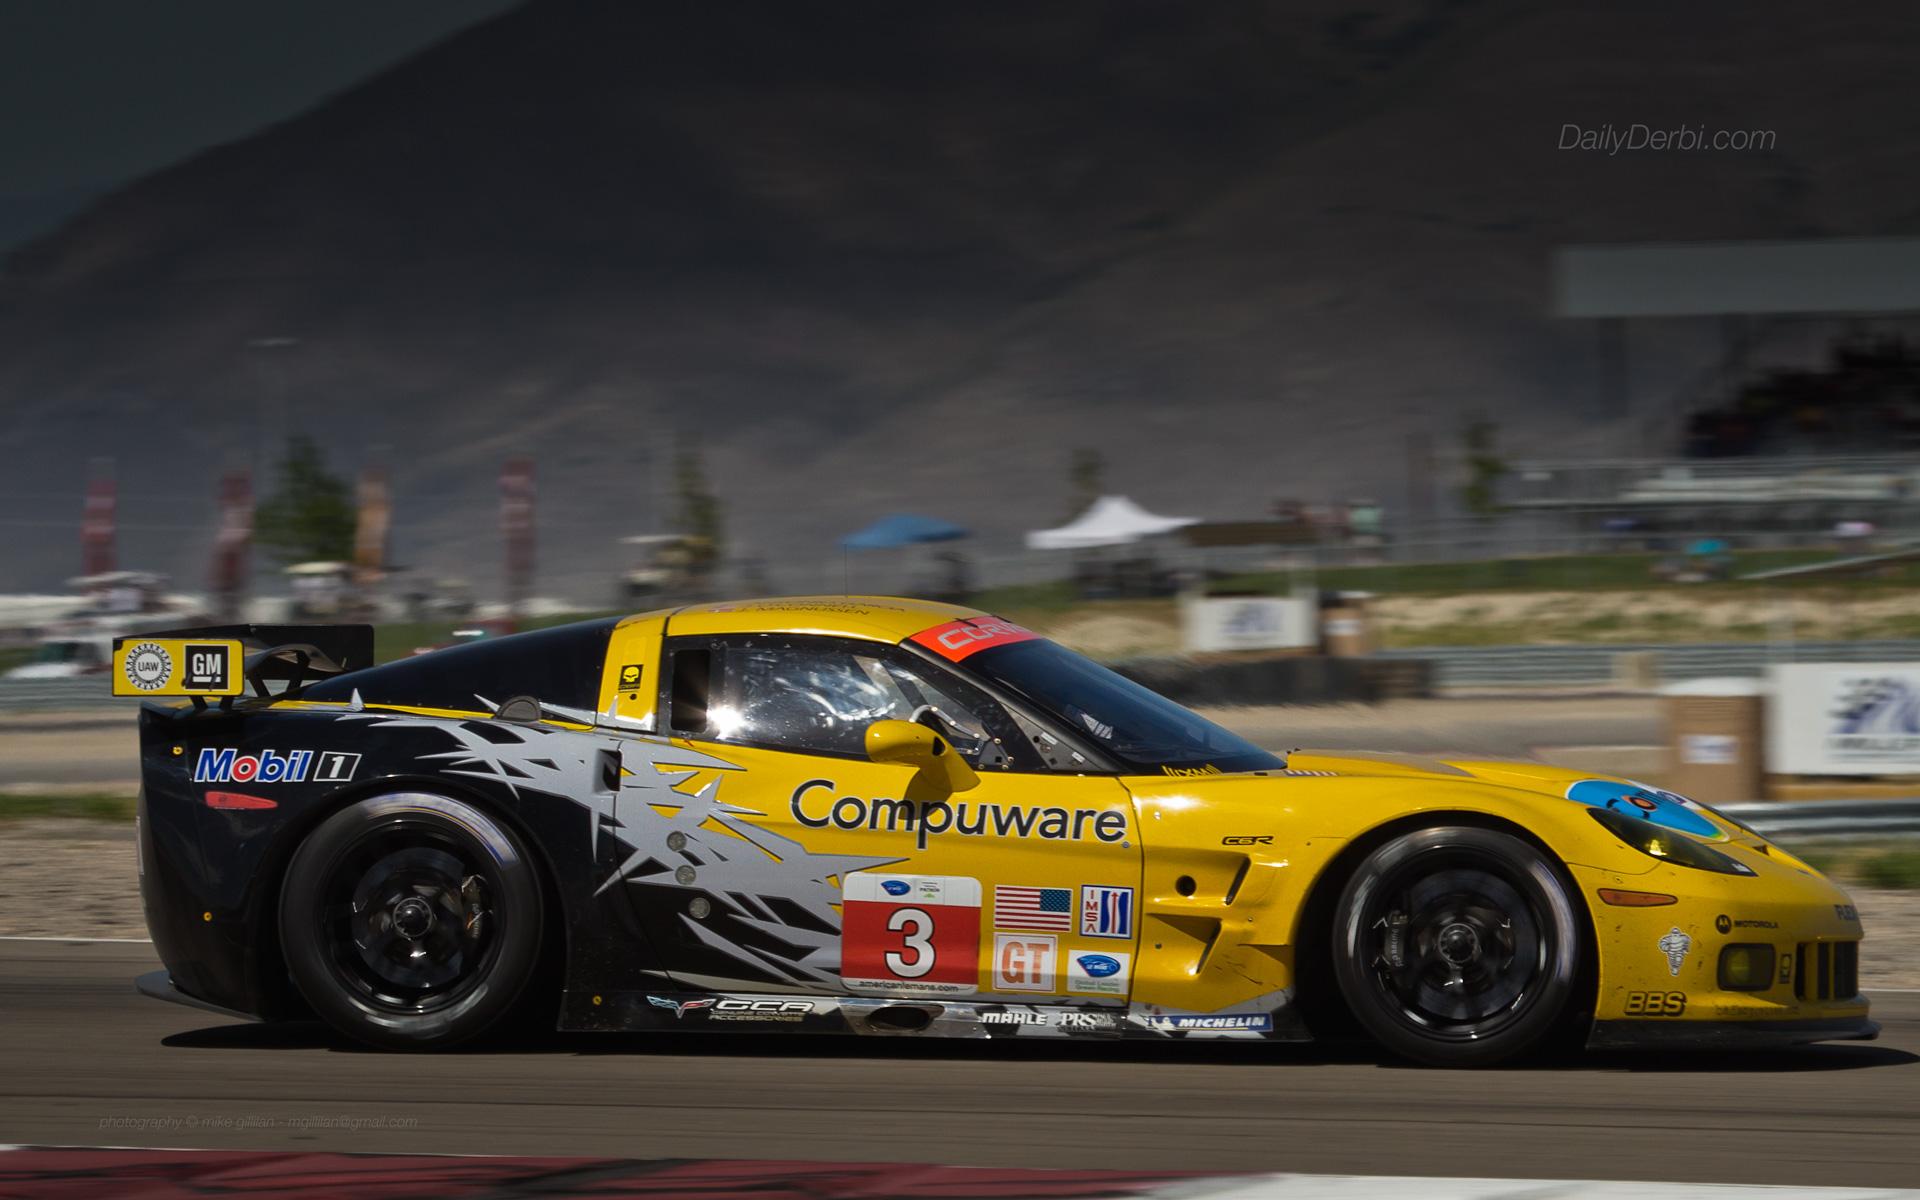 Weekend Wallpaper 3 Corvette Racing C6R The Daily Derbi 1920x1200